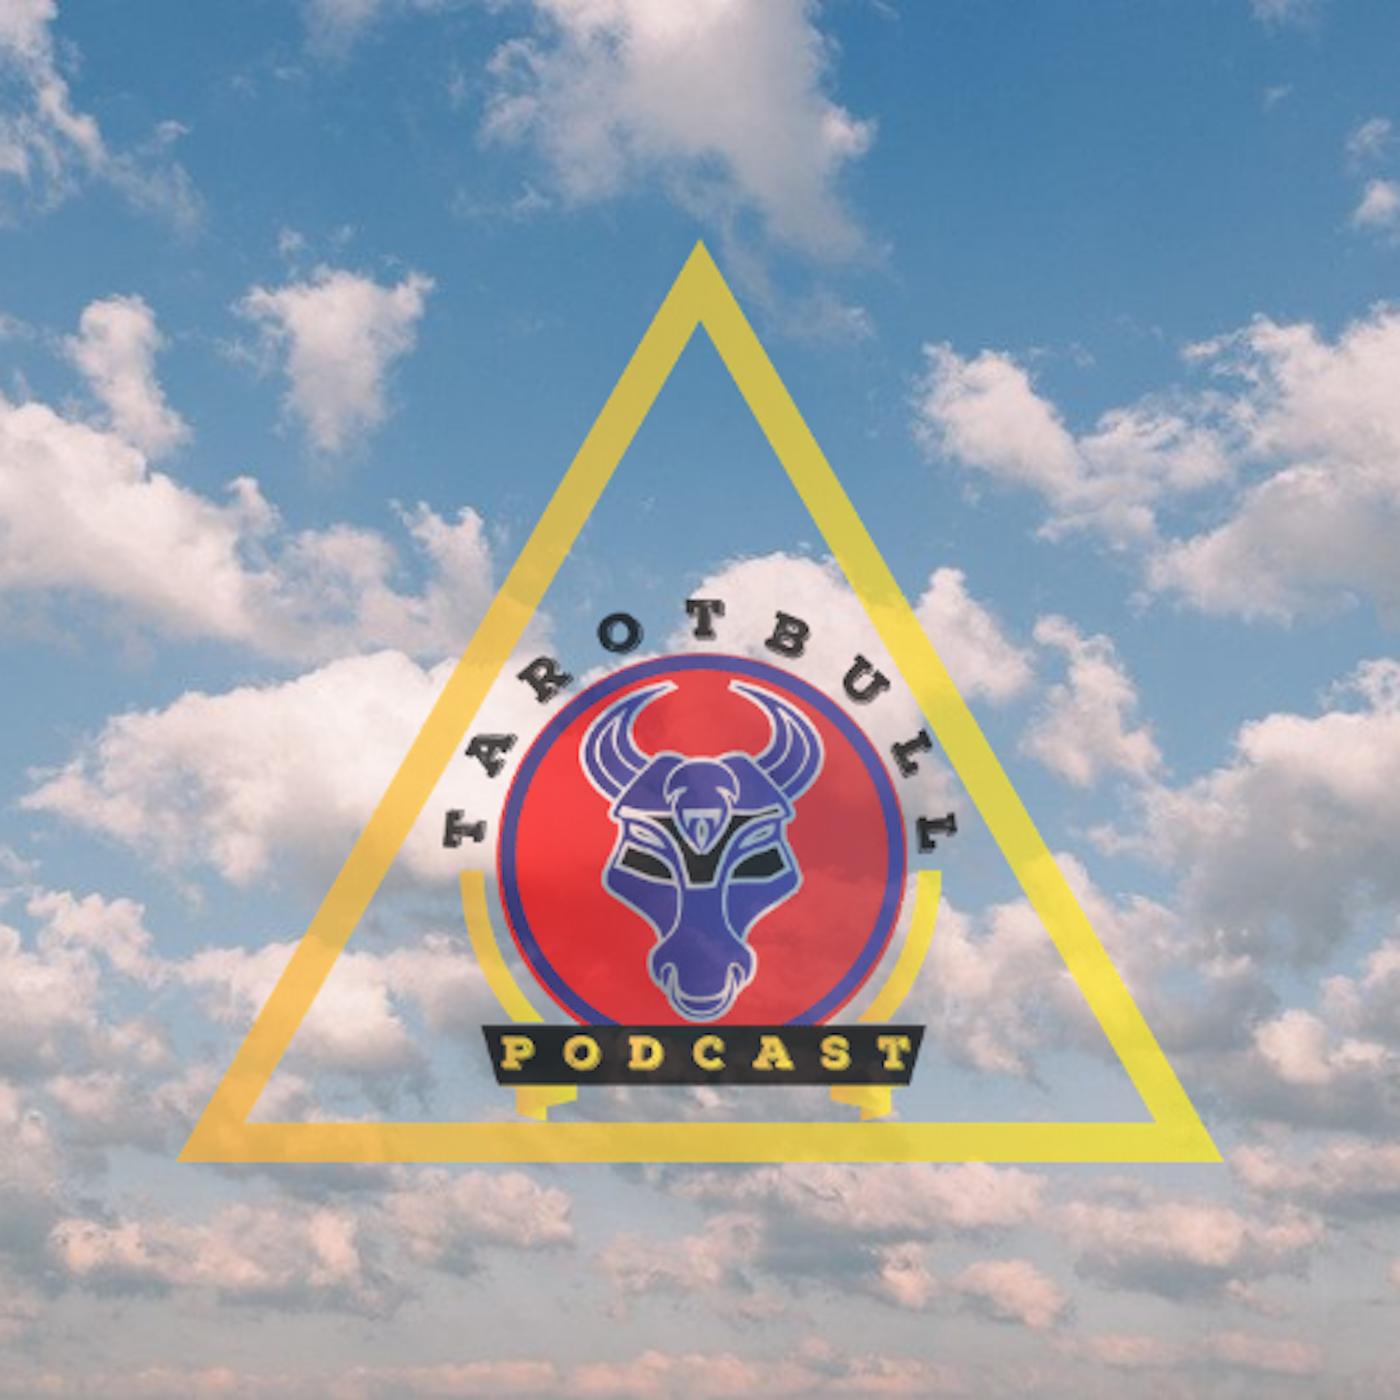 The Tarotbull Podcast show art